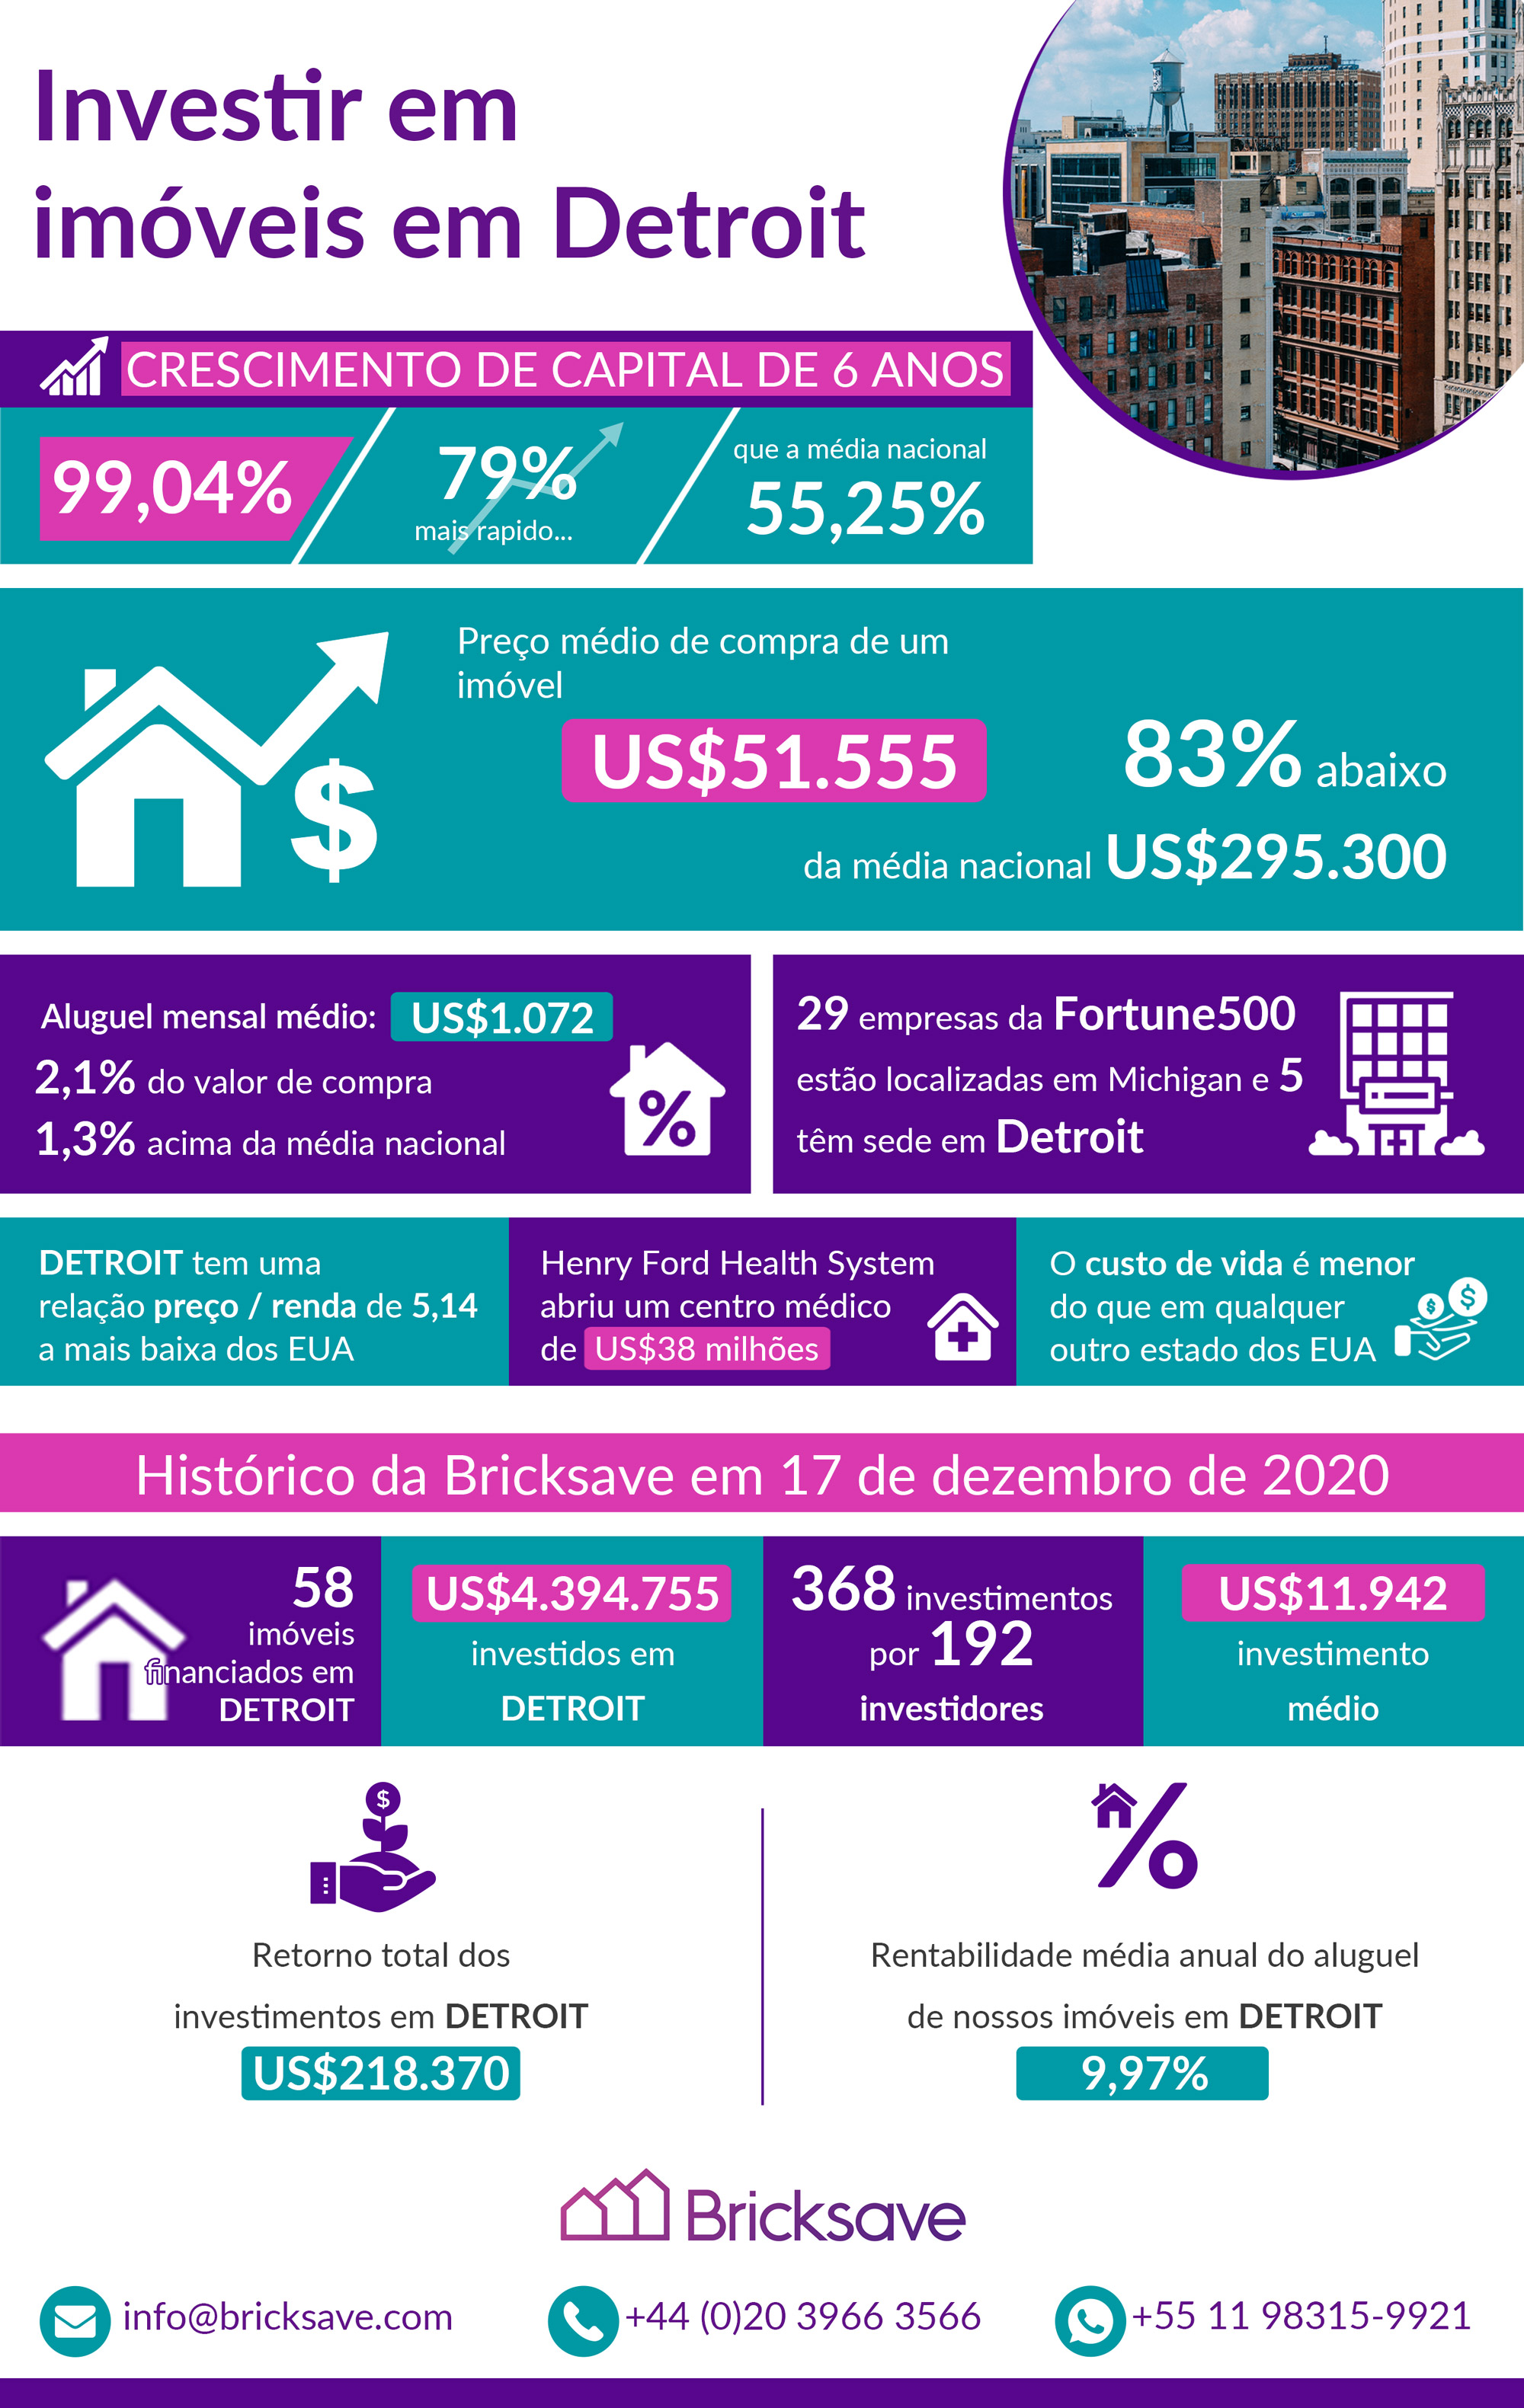 Investir em imóveis em Detroit